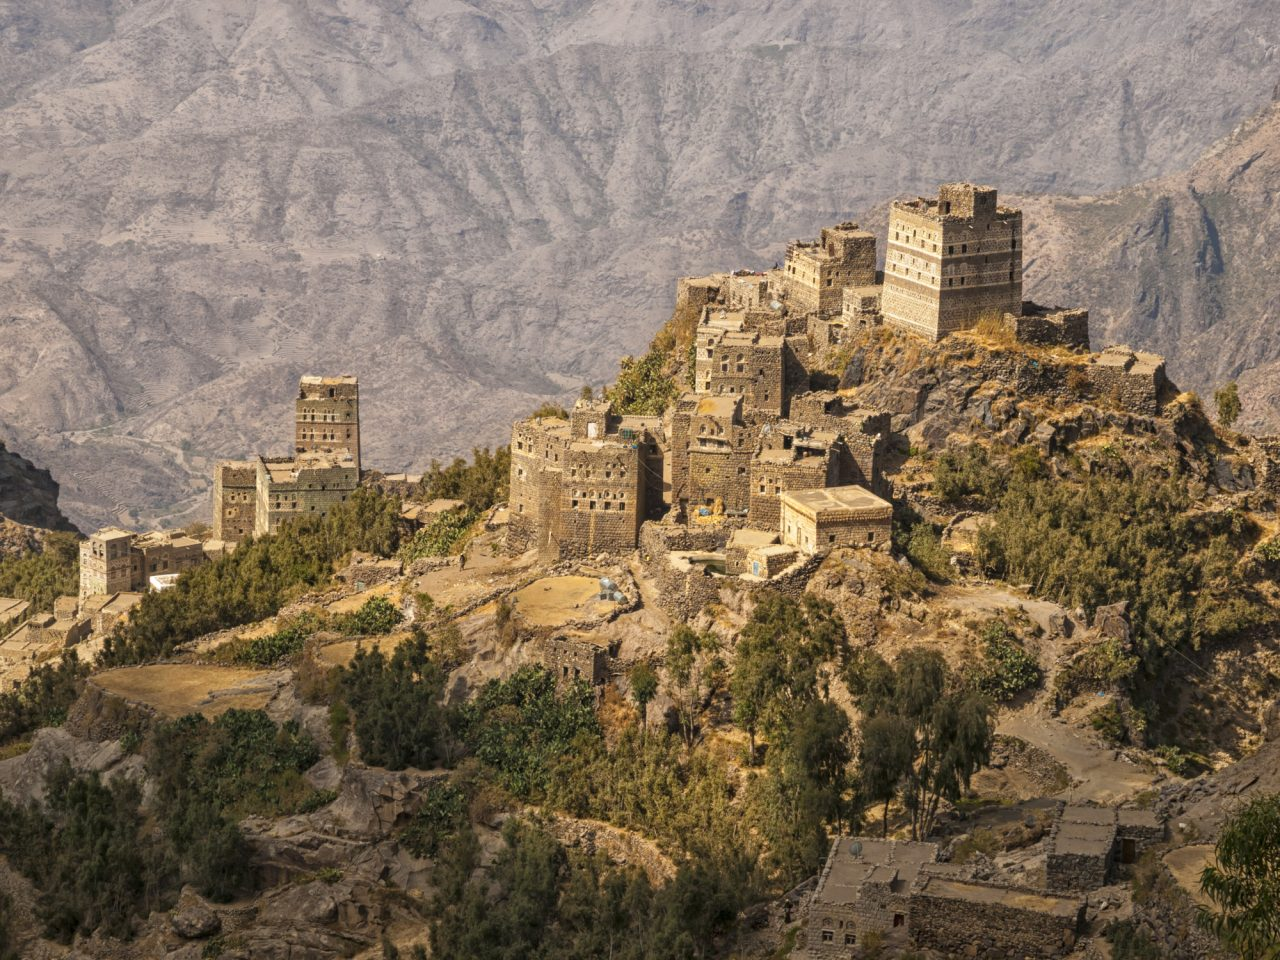 Sufi kloster i Yemen